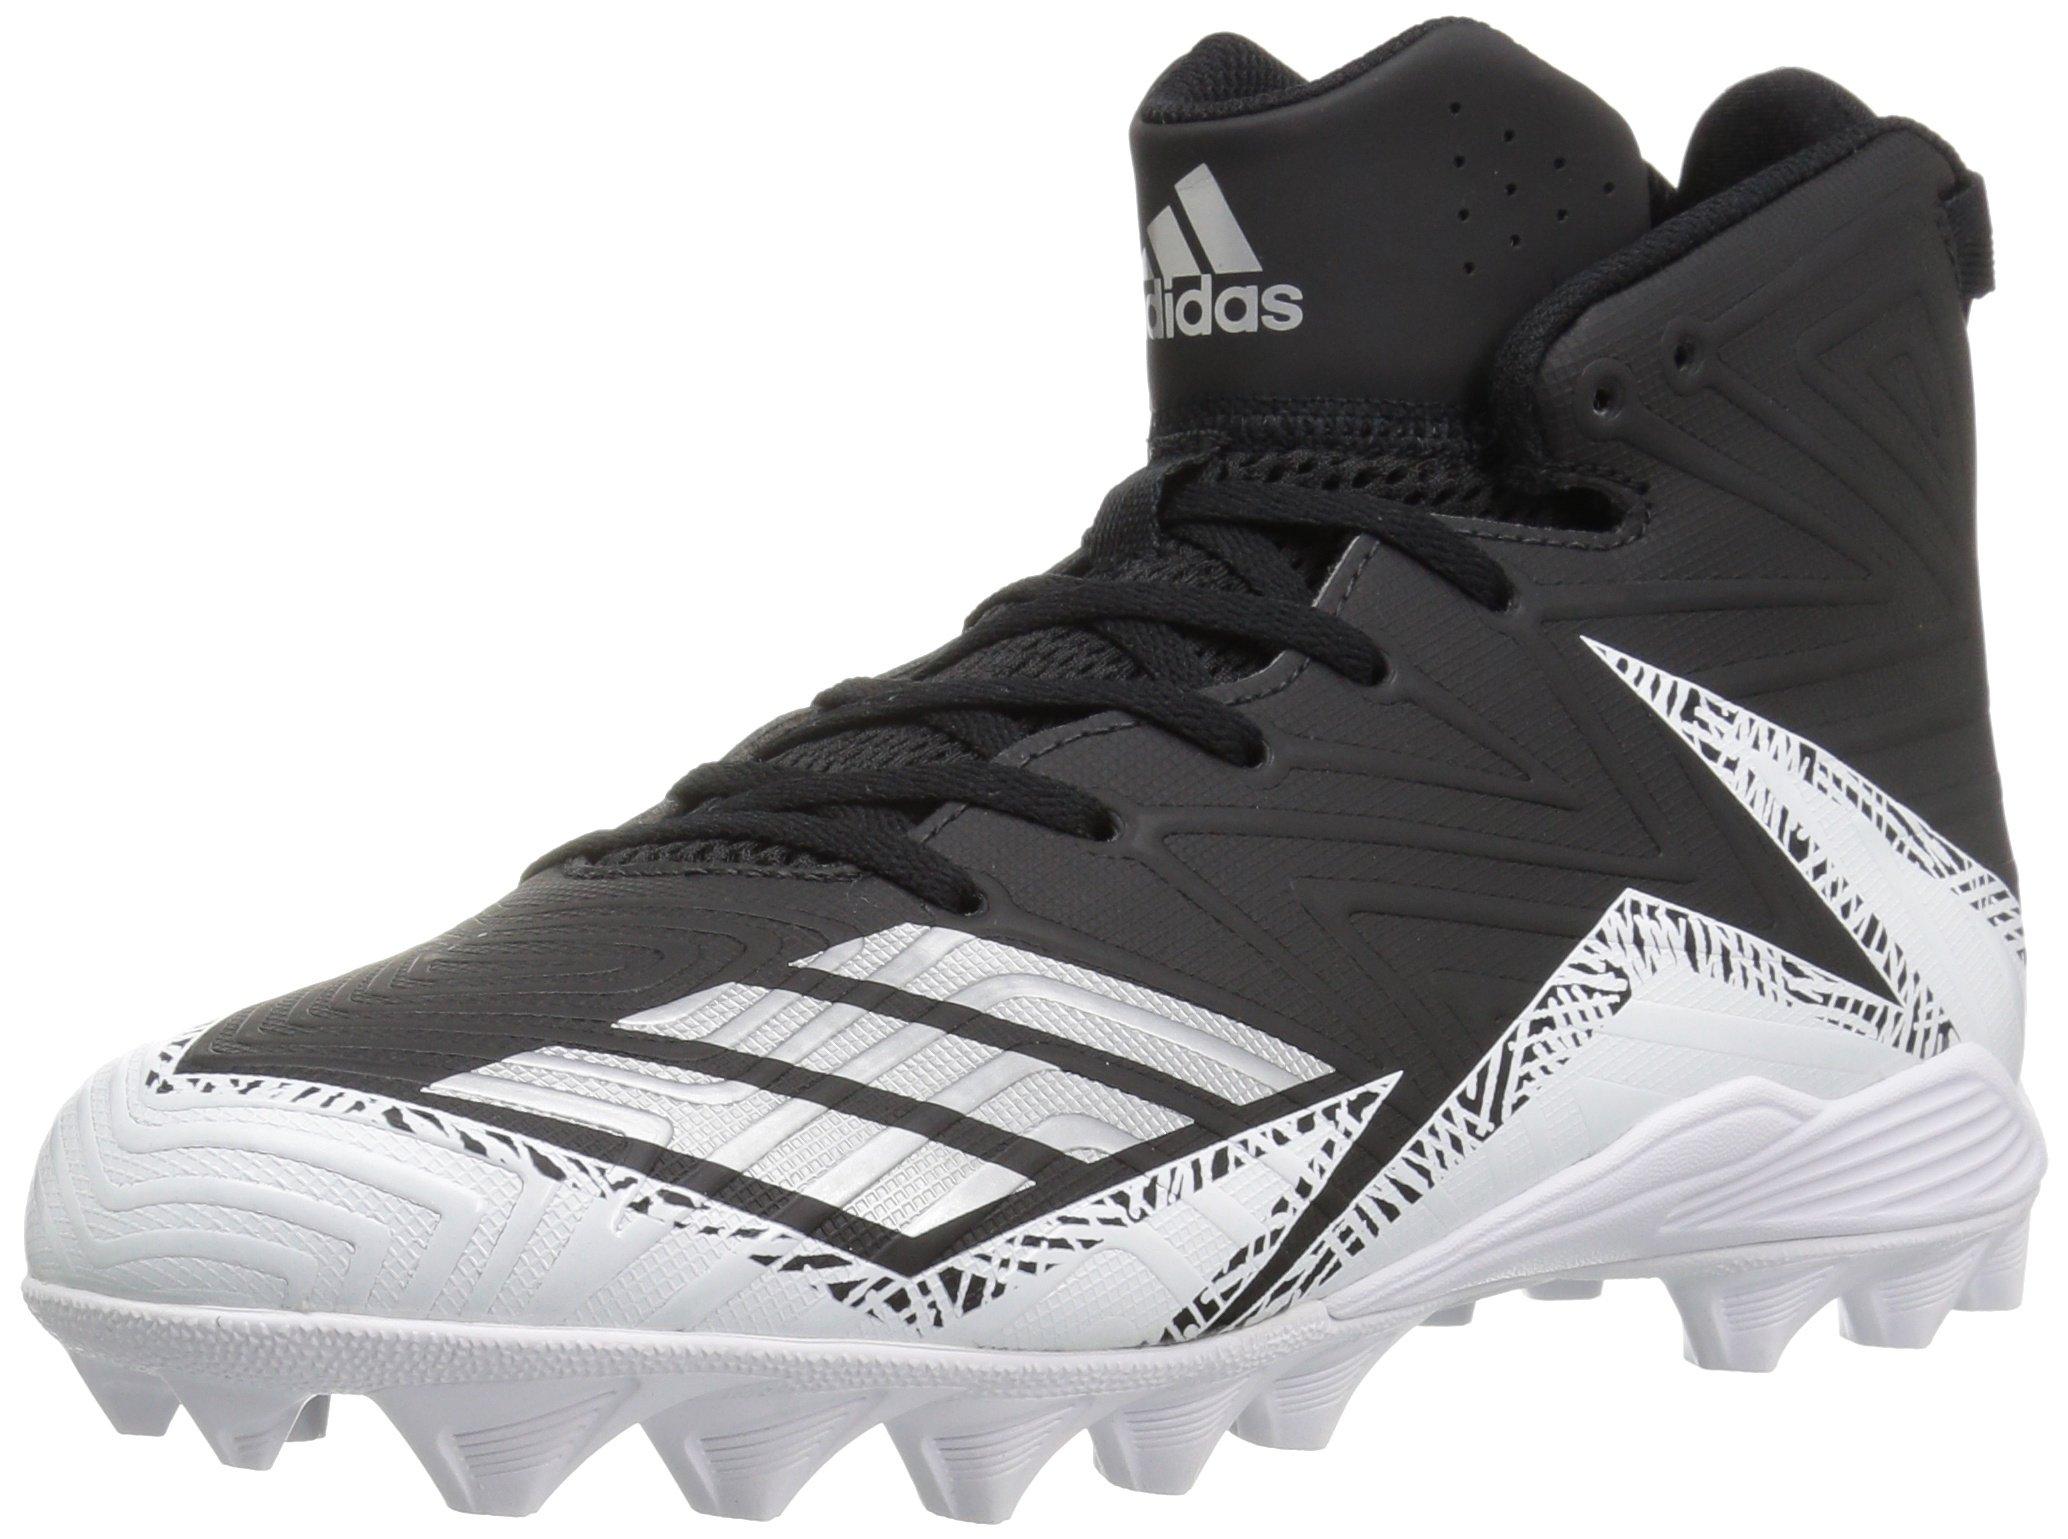 adidas Men's Freak X Carbon Mid Football Shoe, Black/Metallic Silver/White, 14 Medium US